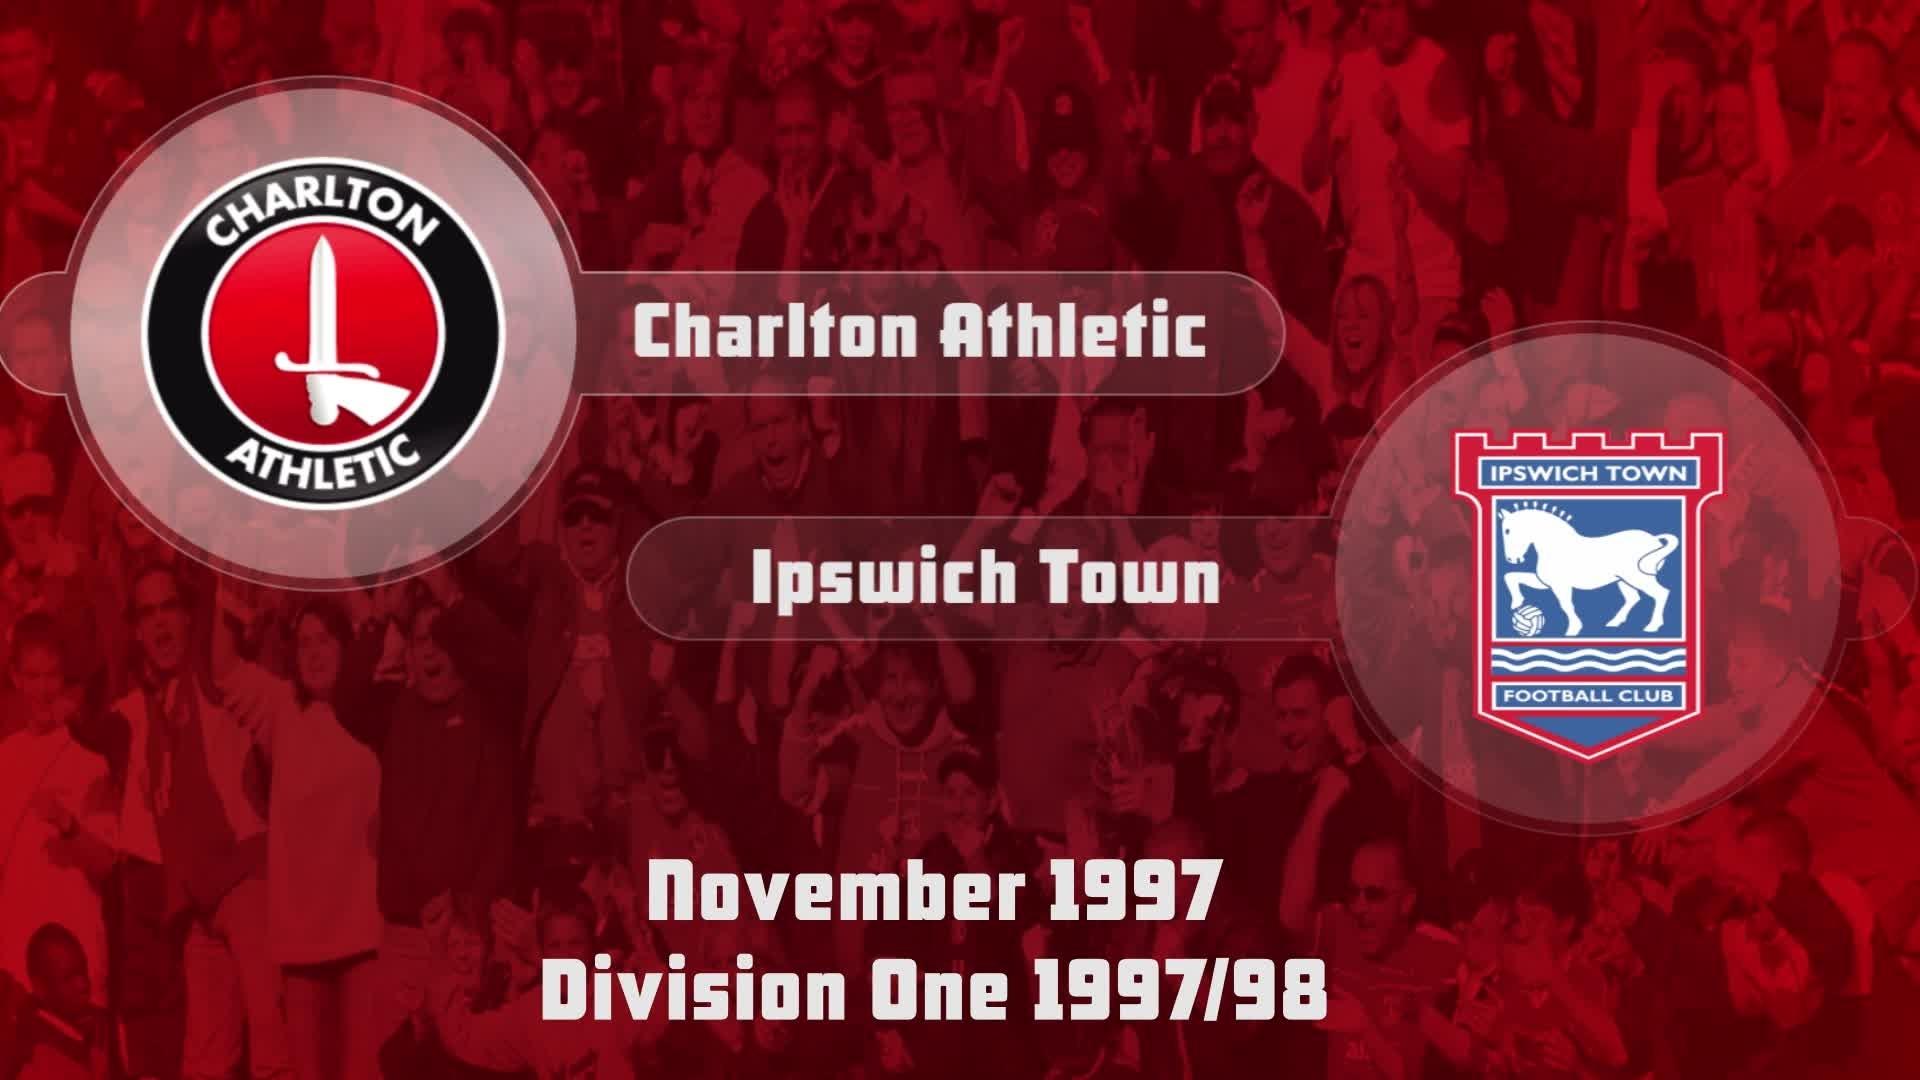 16 HIGHLIGHTS | Charlton 3 Ipswich 0 (Nov 1997)